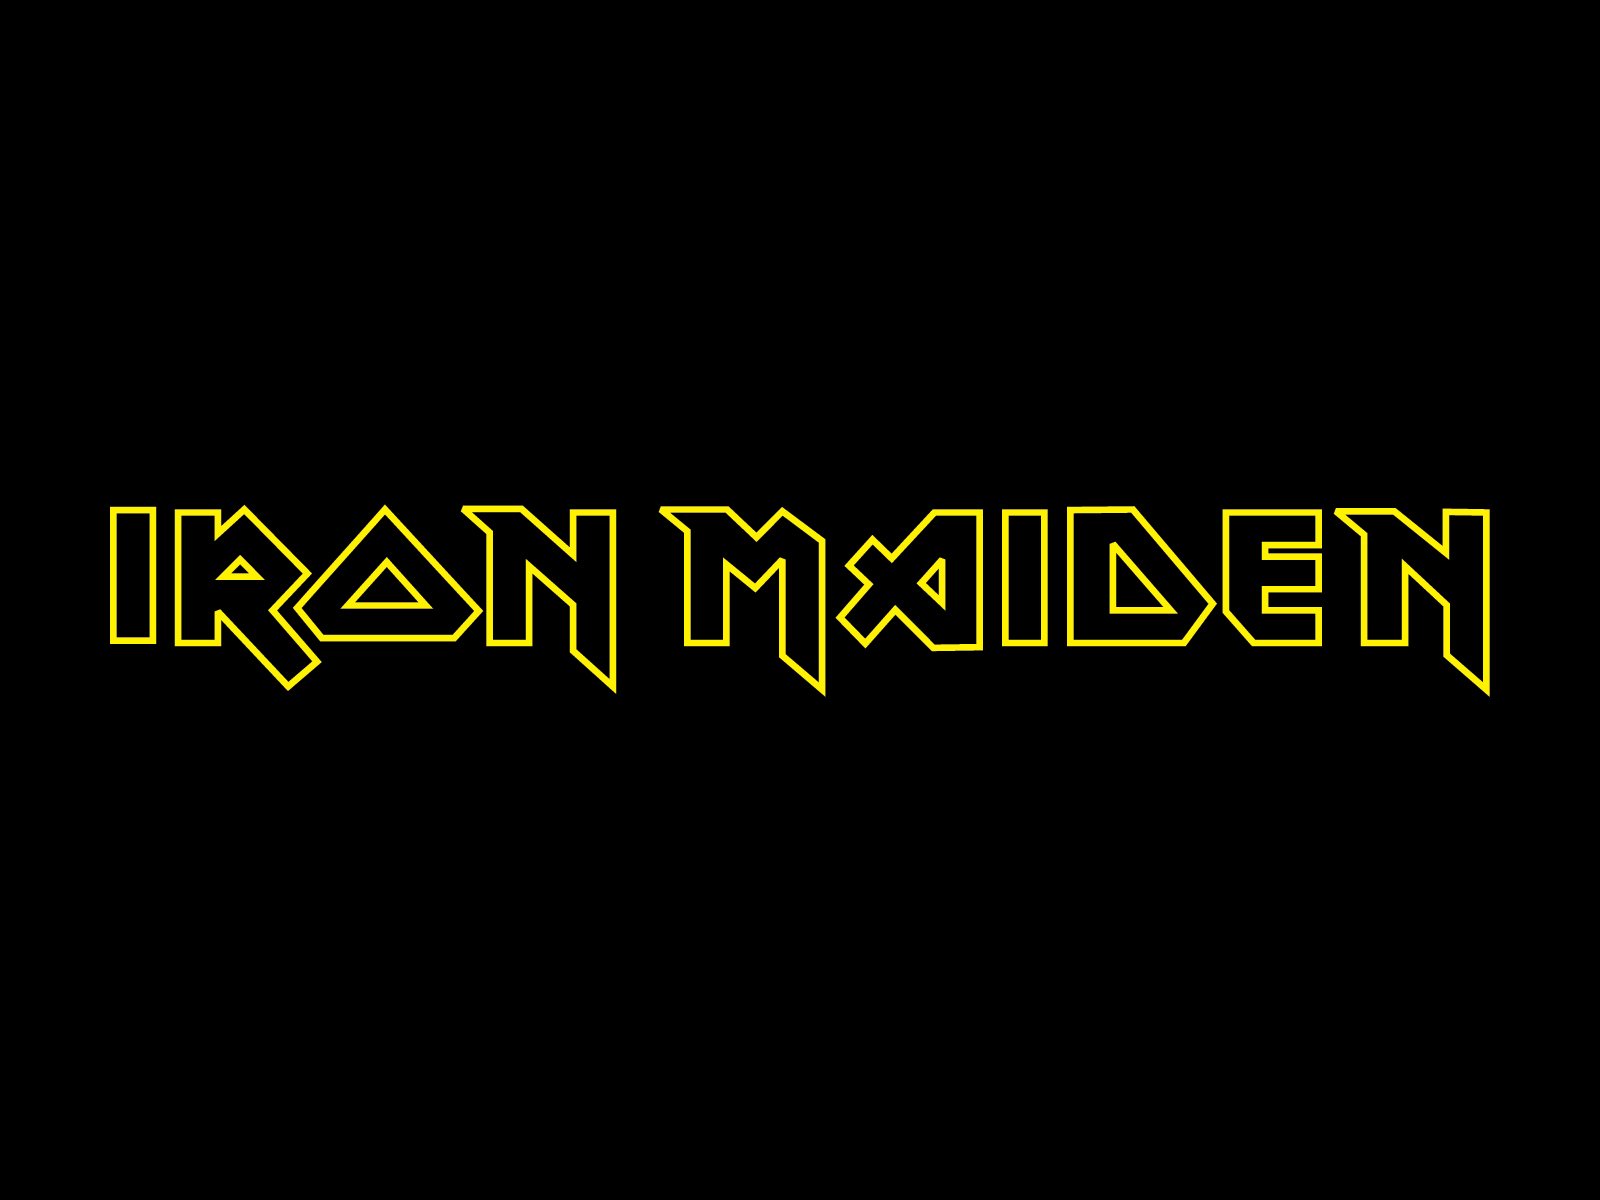 Iron Maiden band logo wallpapers Band logos   Rock band logos metal 1600x1200